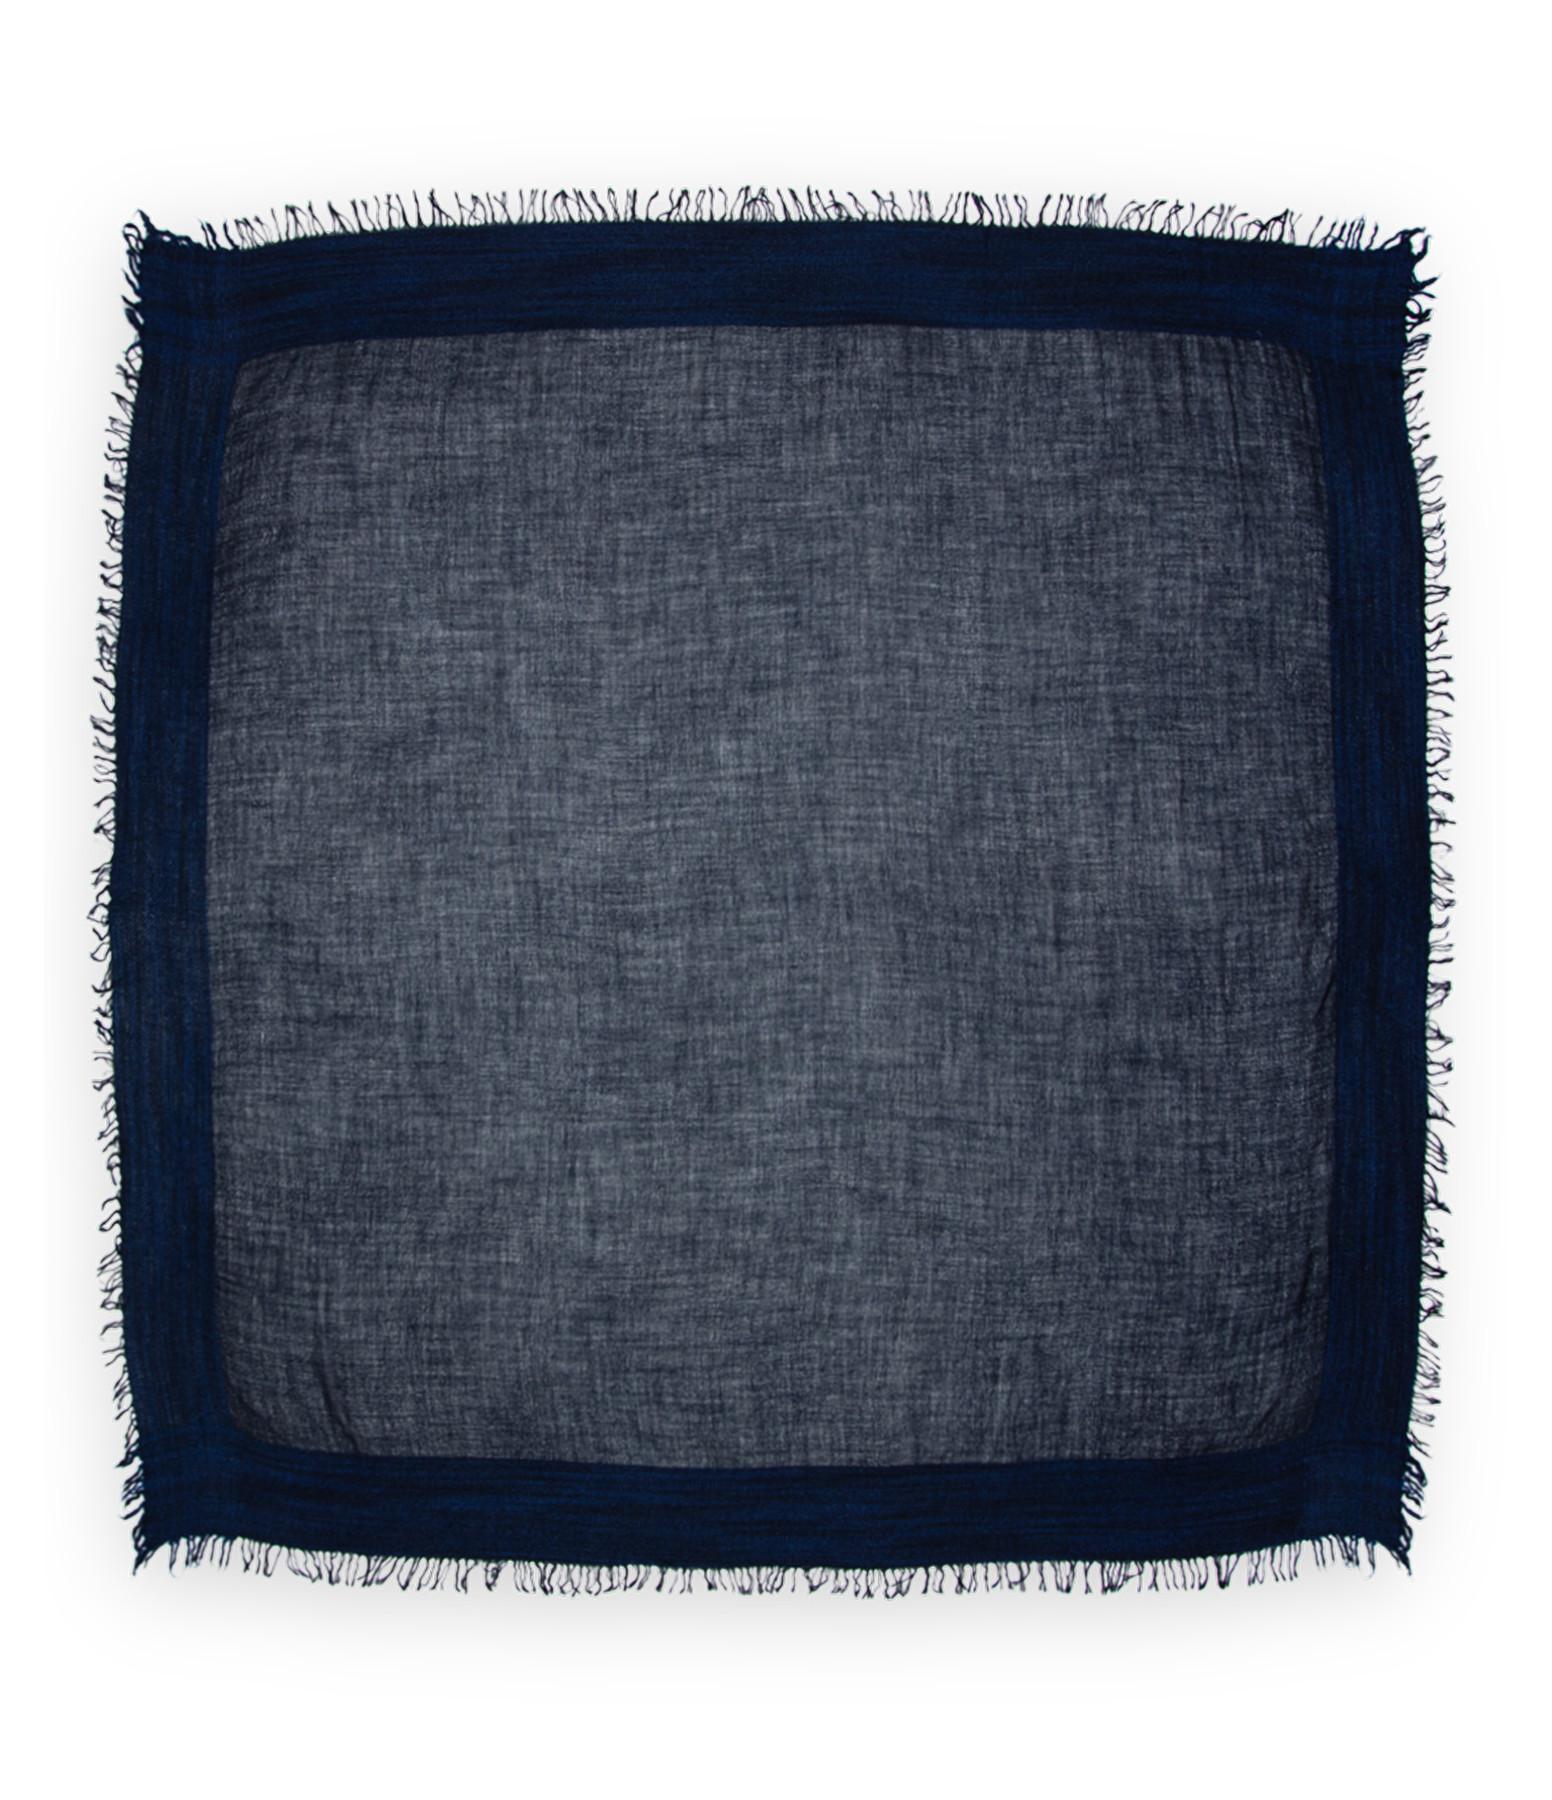 FALIERO SARTI - Foulard Leonor Cachemire Soie Laine Bleu